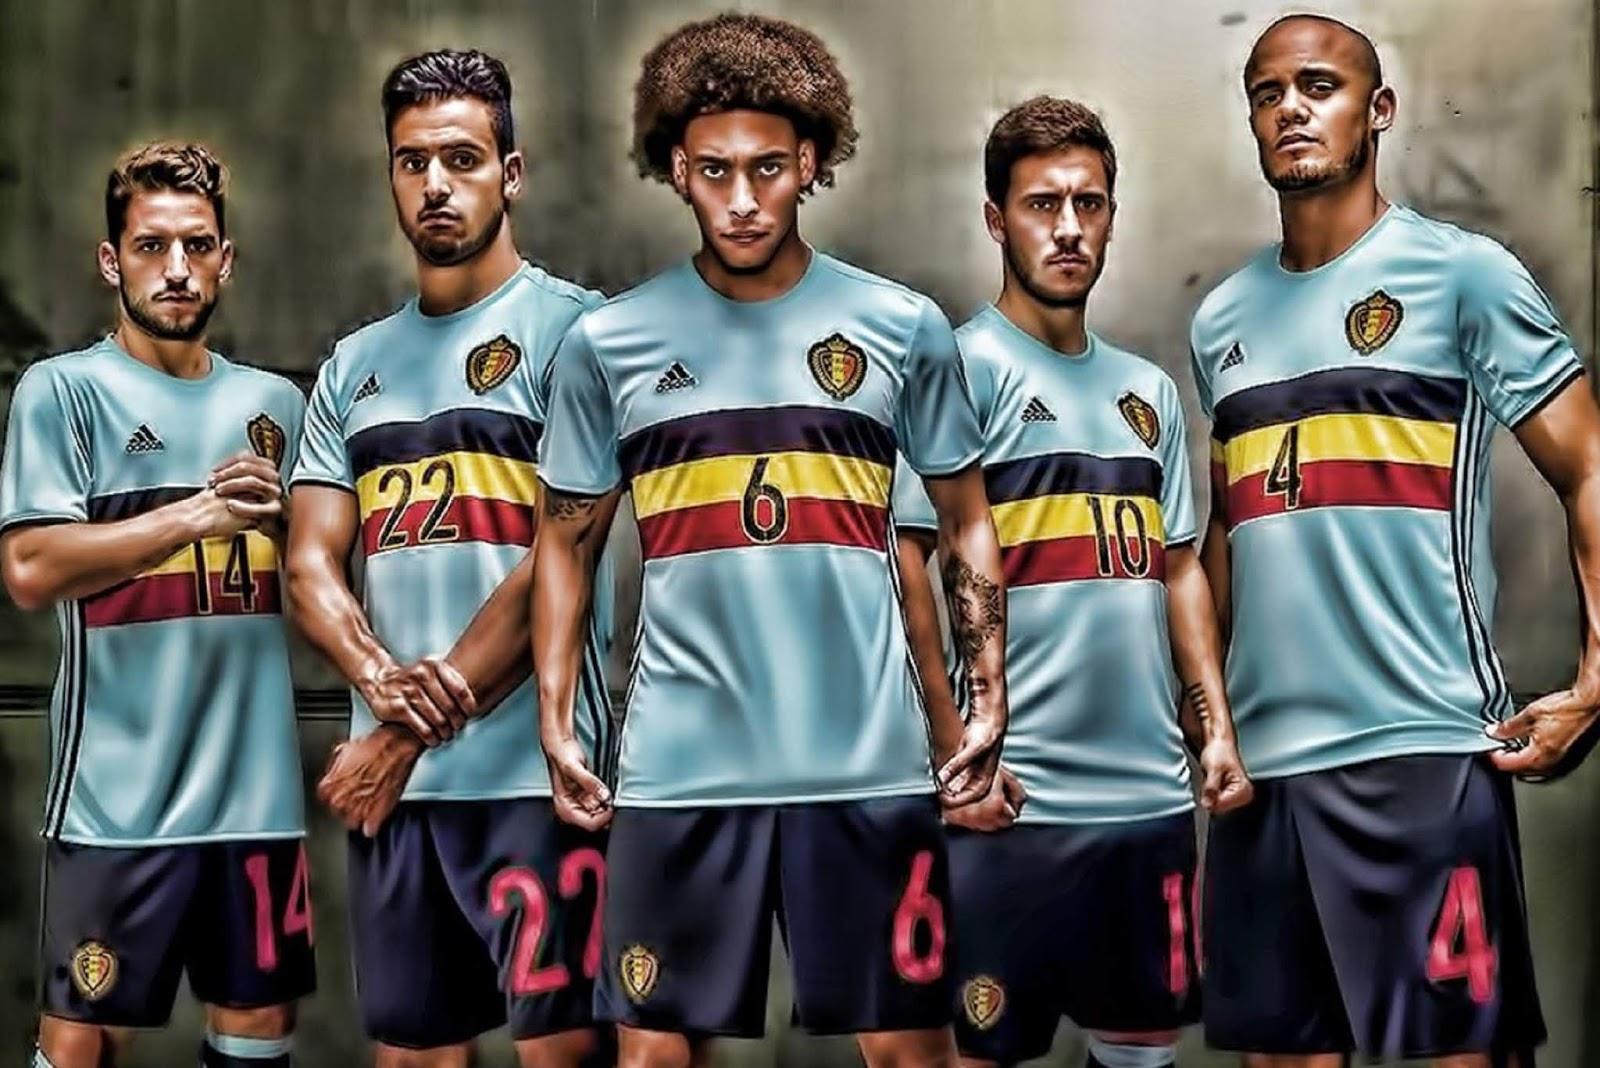 WORLD CUP, BELGIUM 4